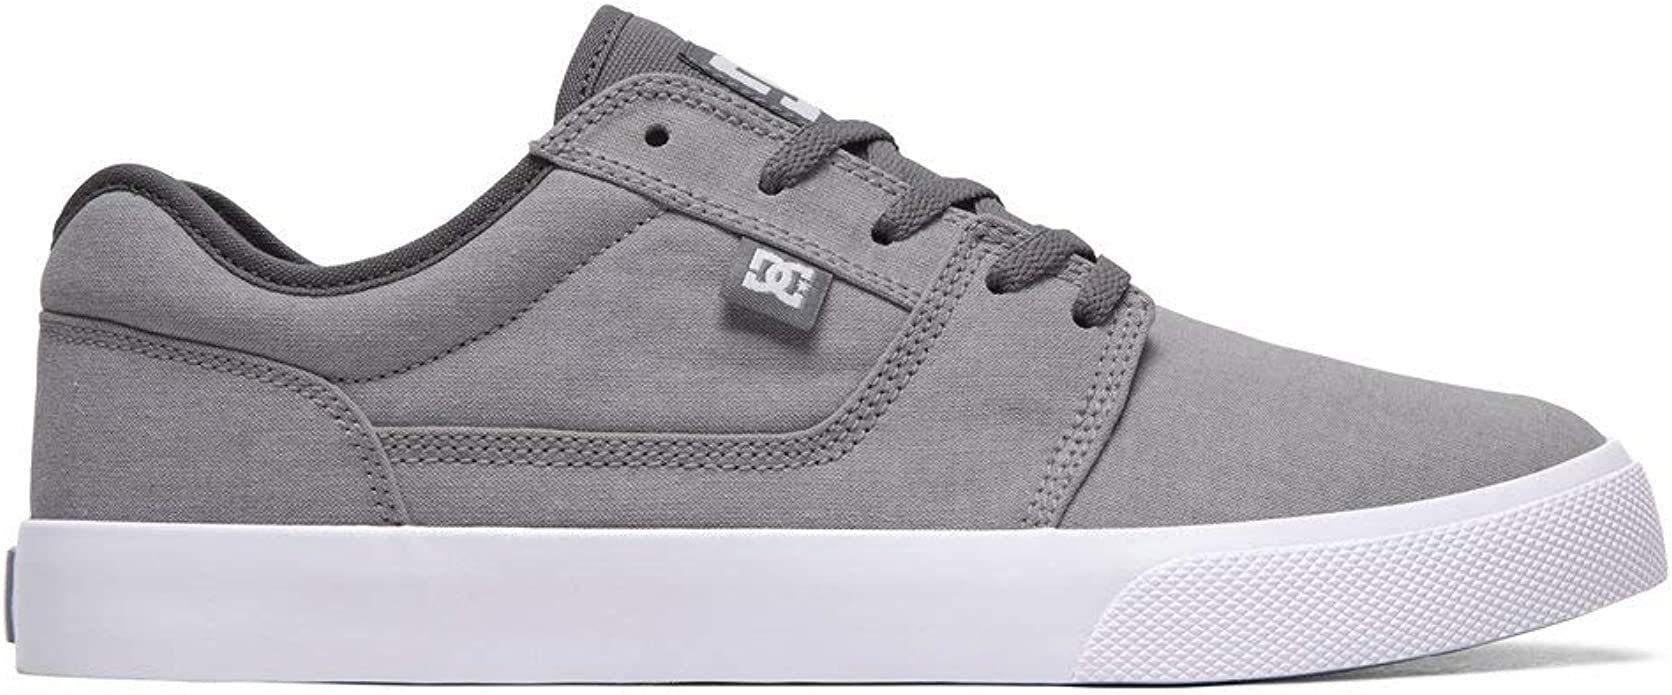 DC Shoes Tonik TX SE Sneakers Skateschuhe Herren Grau